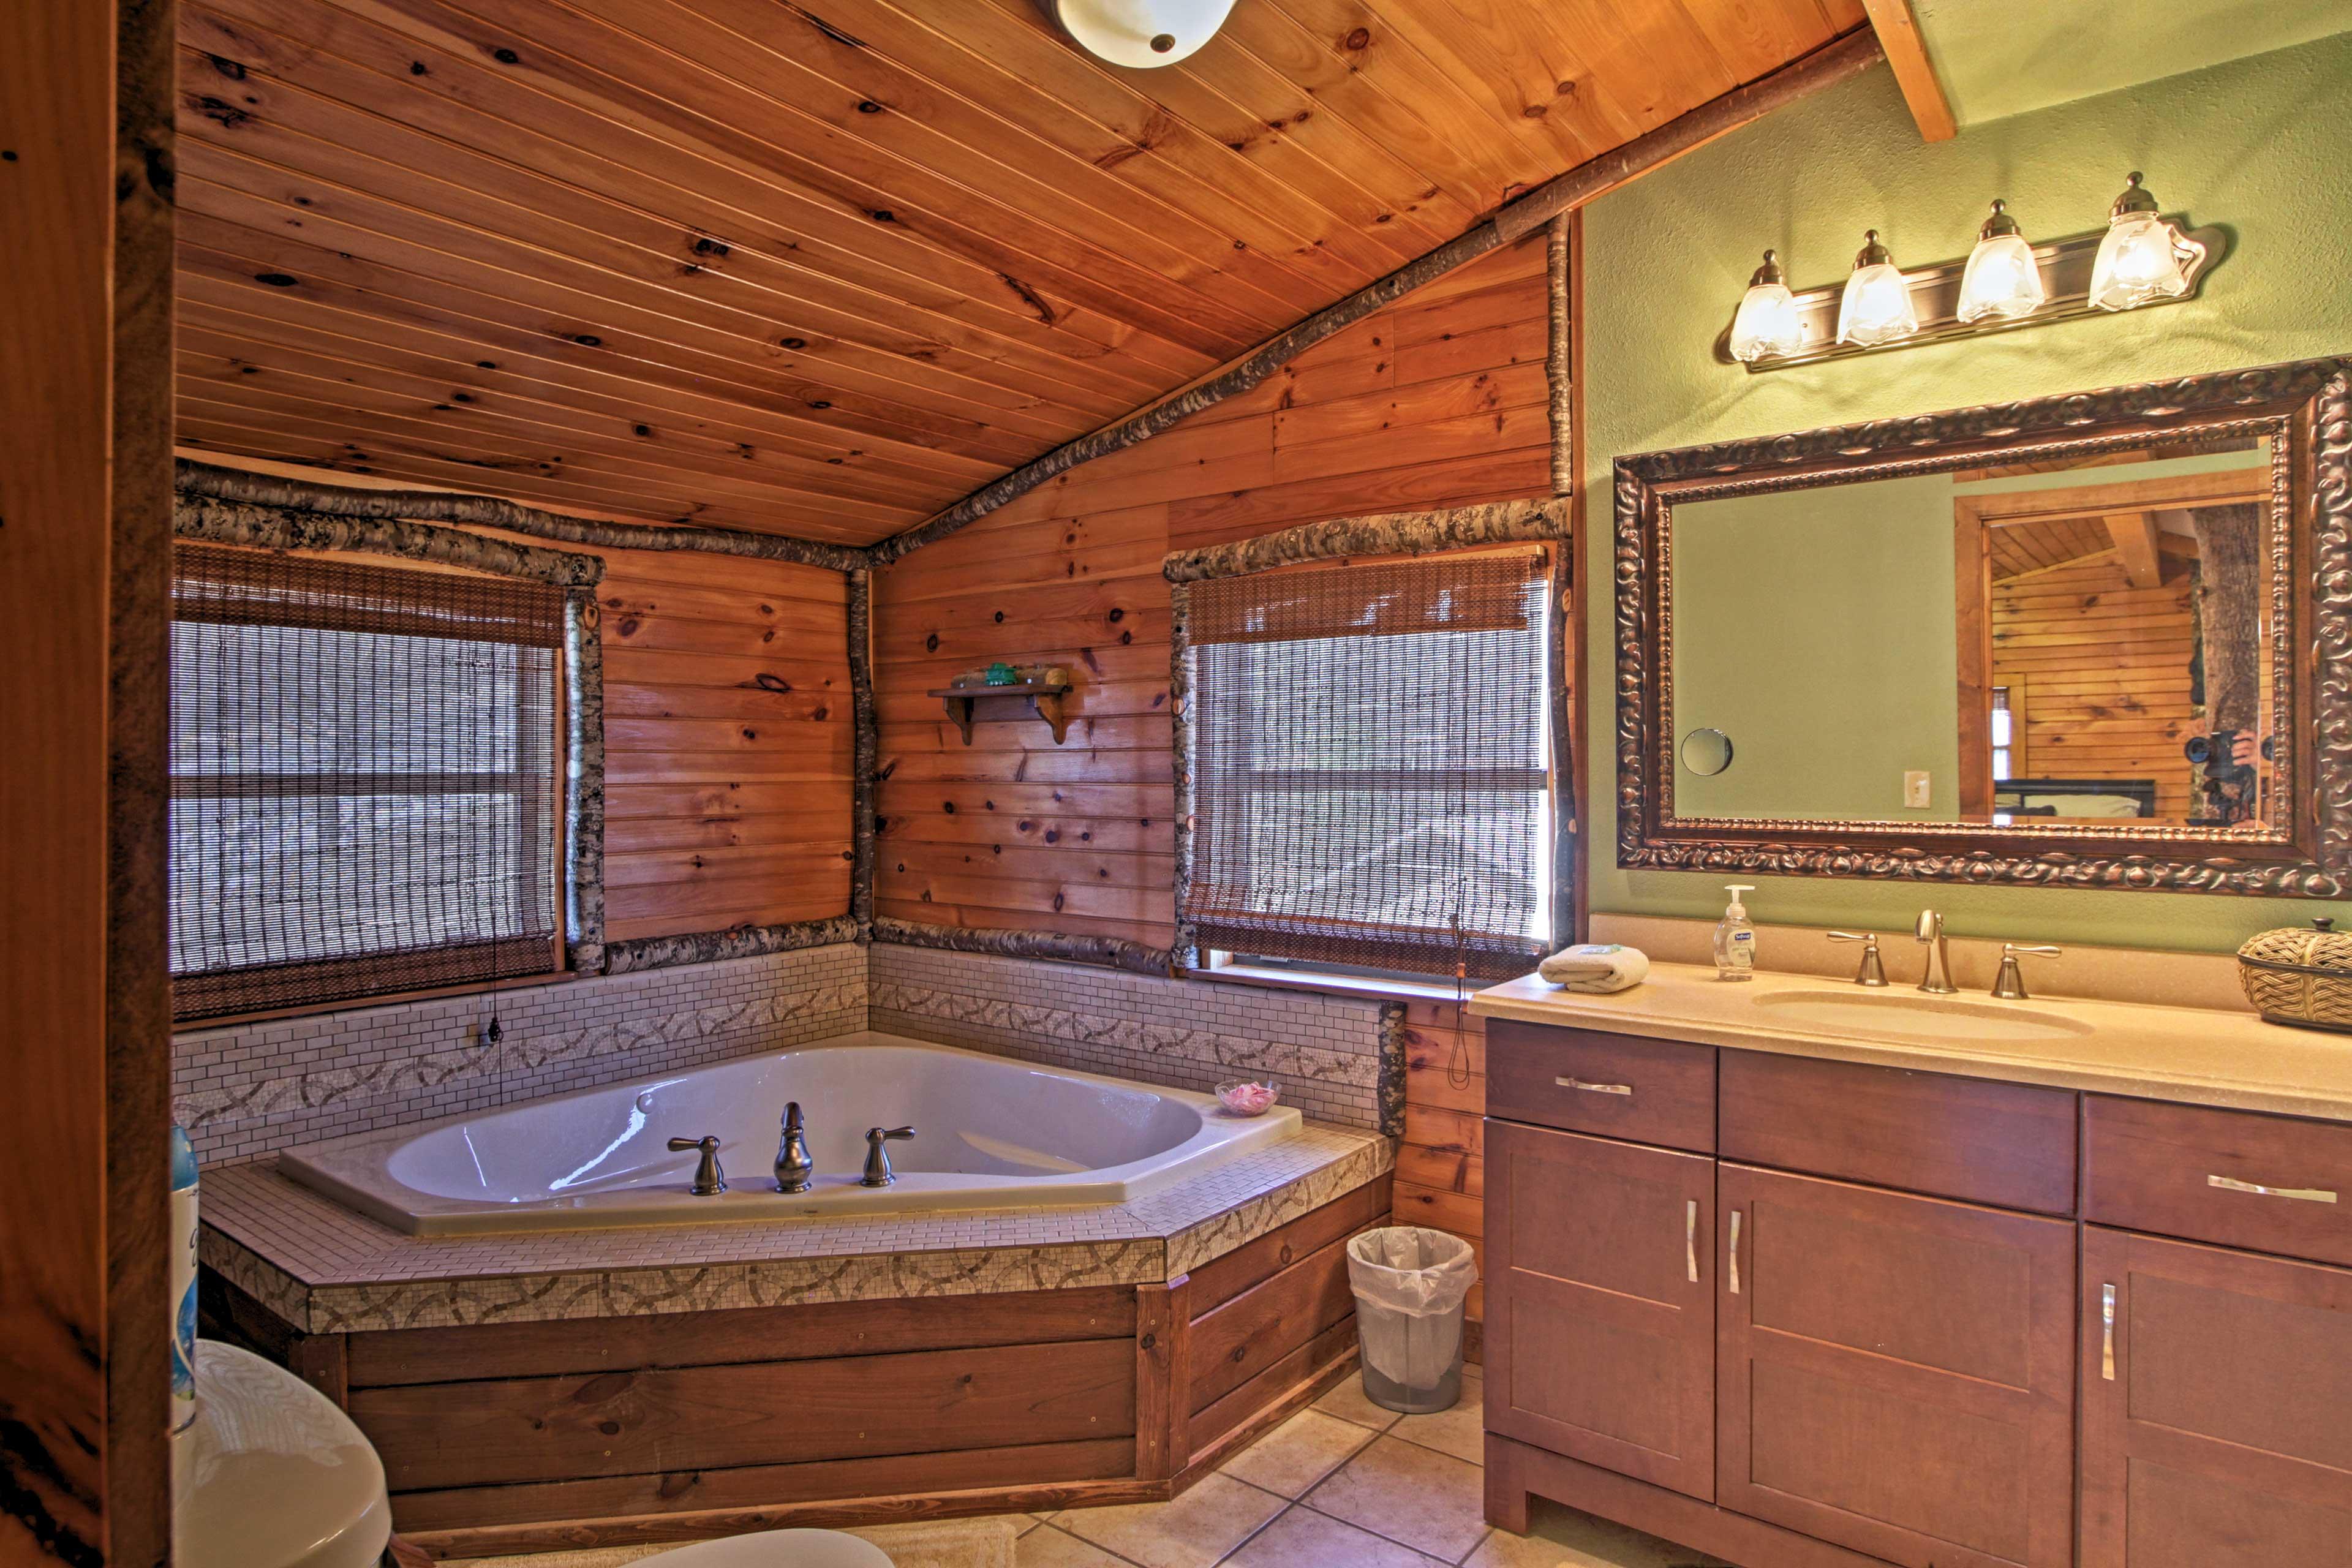 The en-suite bathroom houses a large soaking tub.